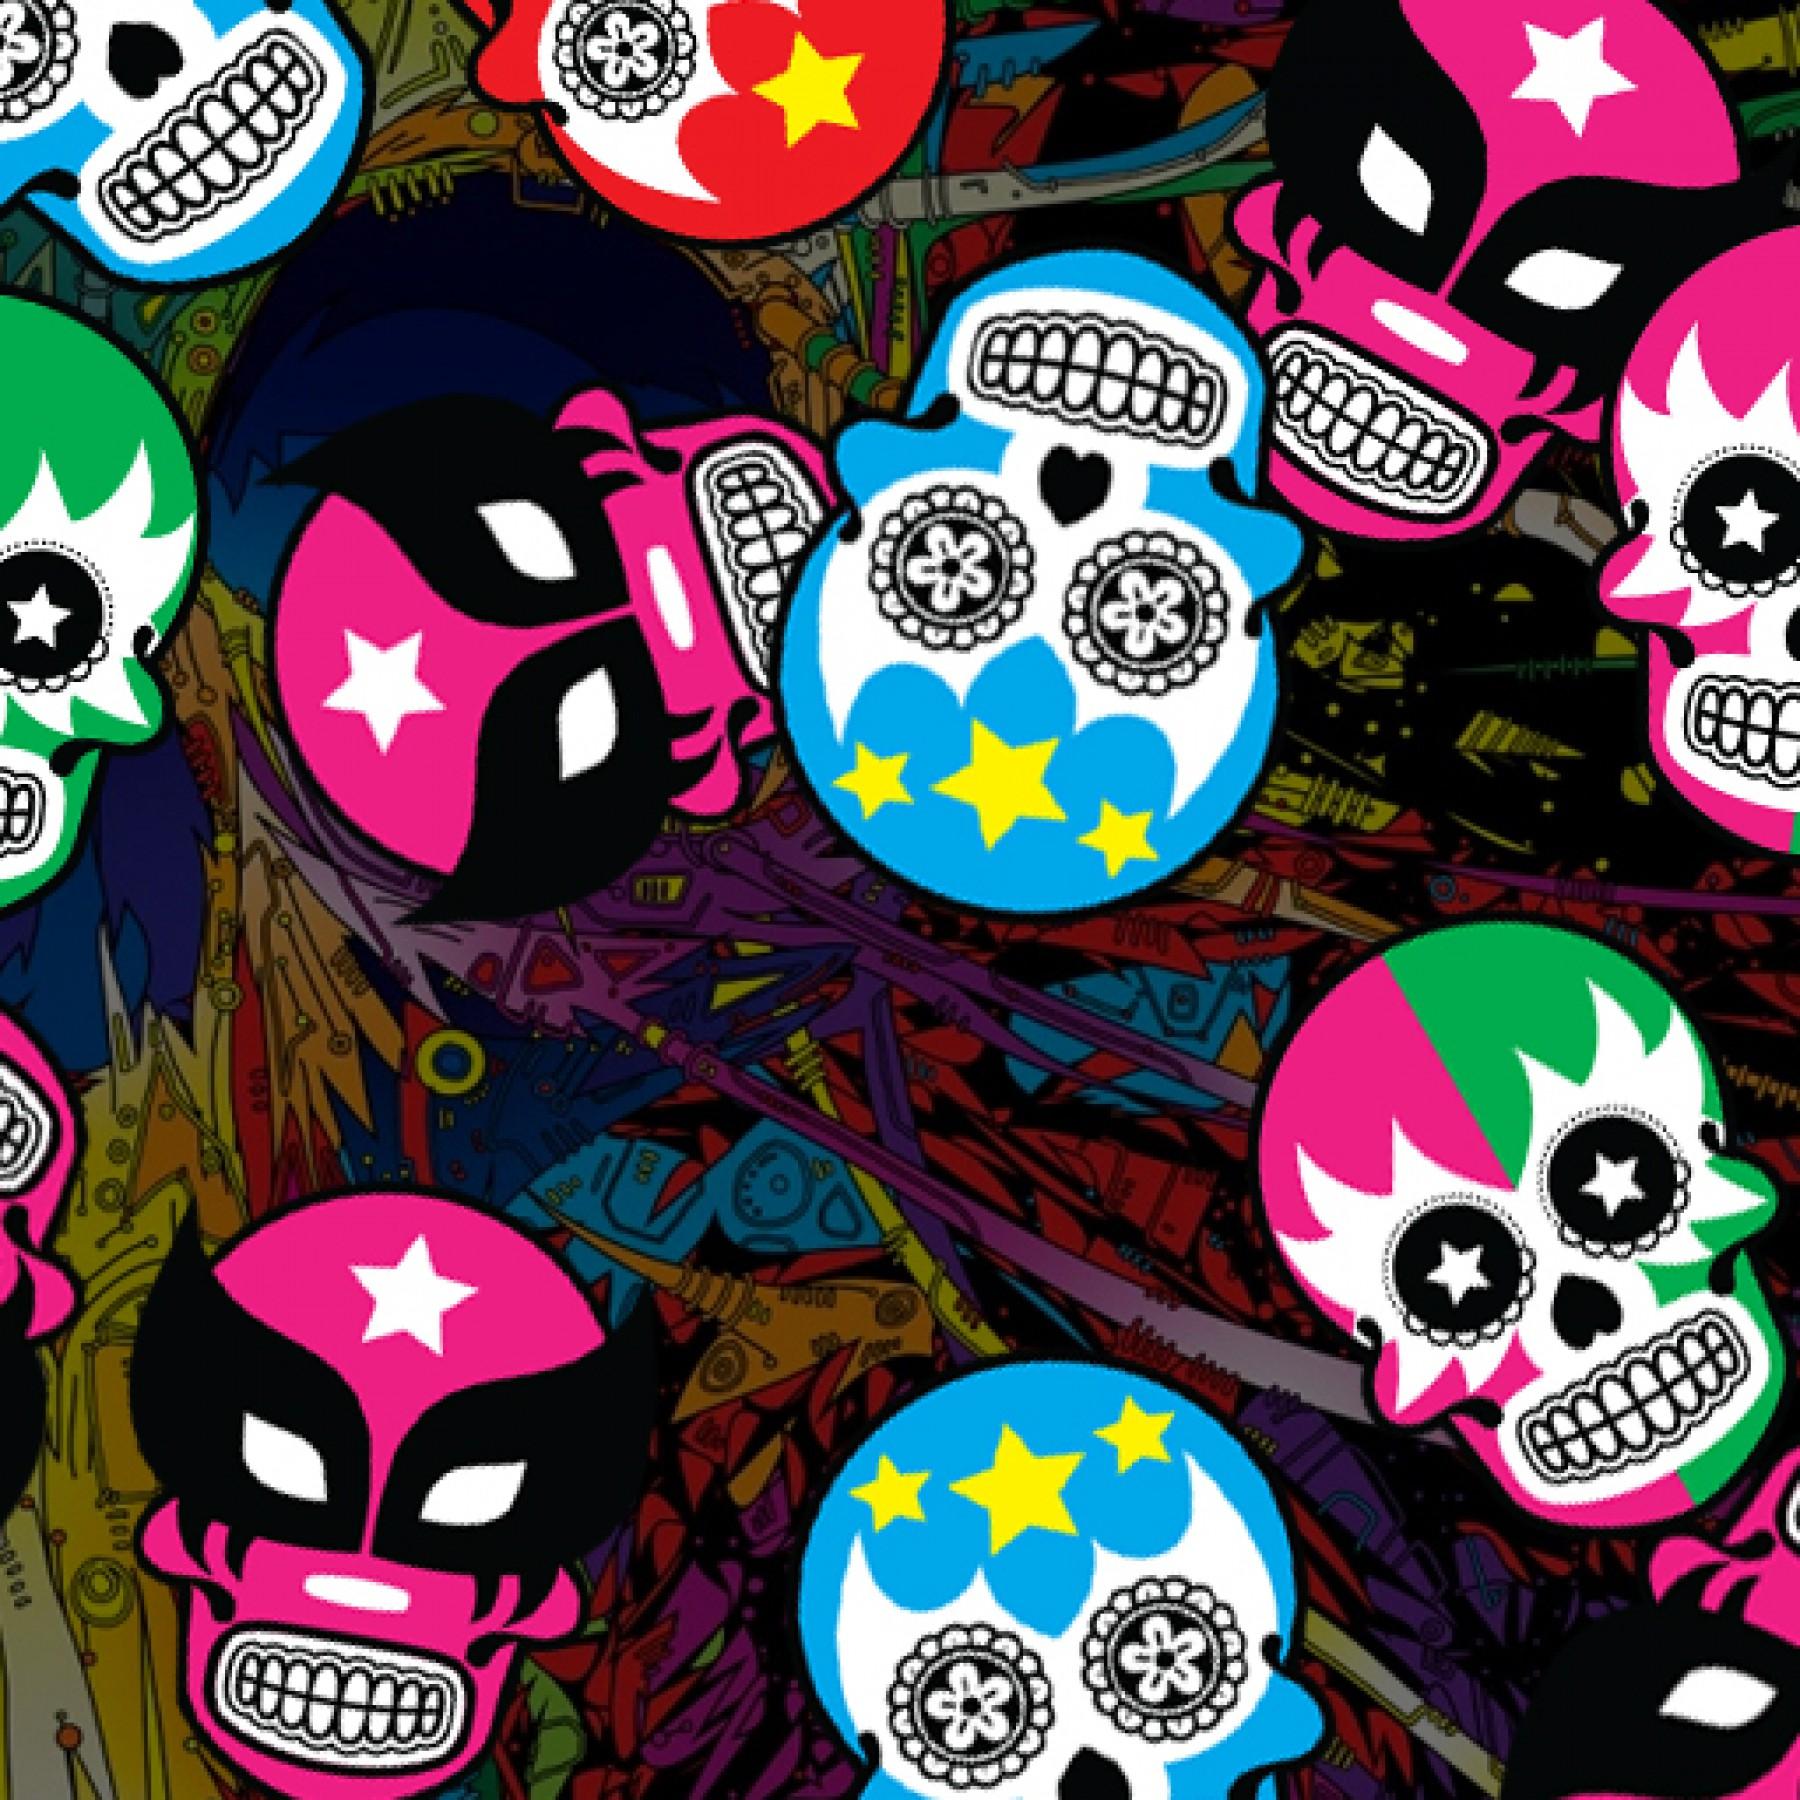 sugar-skulls-travel-kids-adults-festive-mysterious-sensory-main-location1